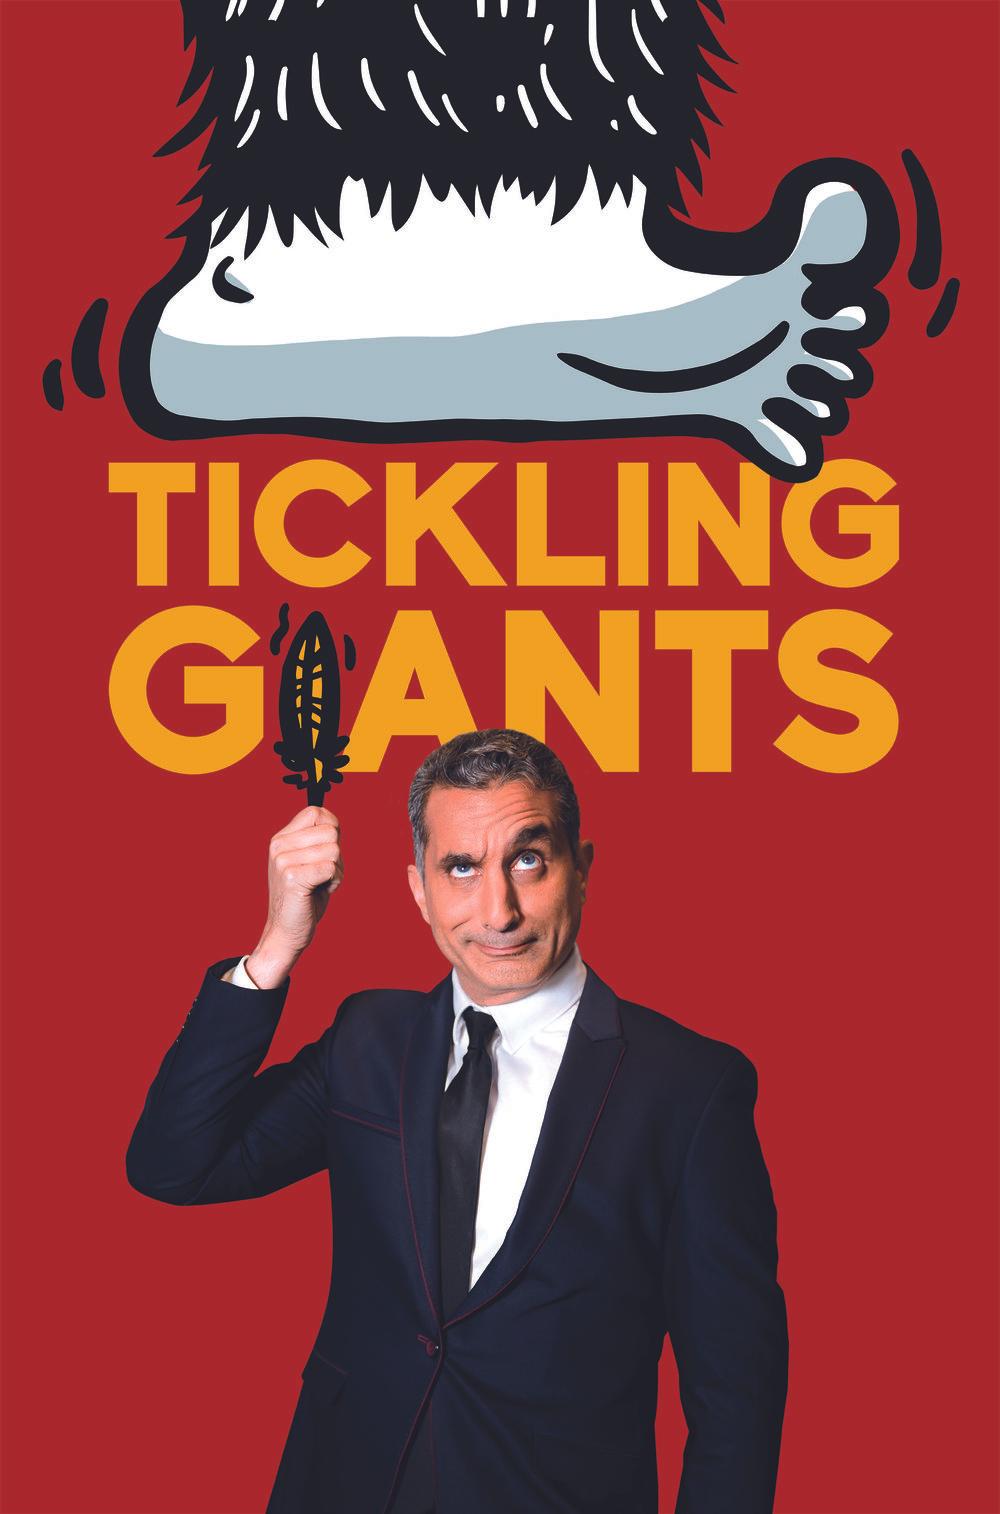 Doku: Tickling Giants - Humor als Waffe (TV-Stream + DL)